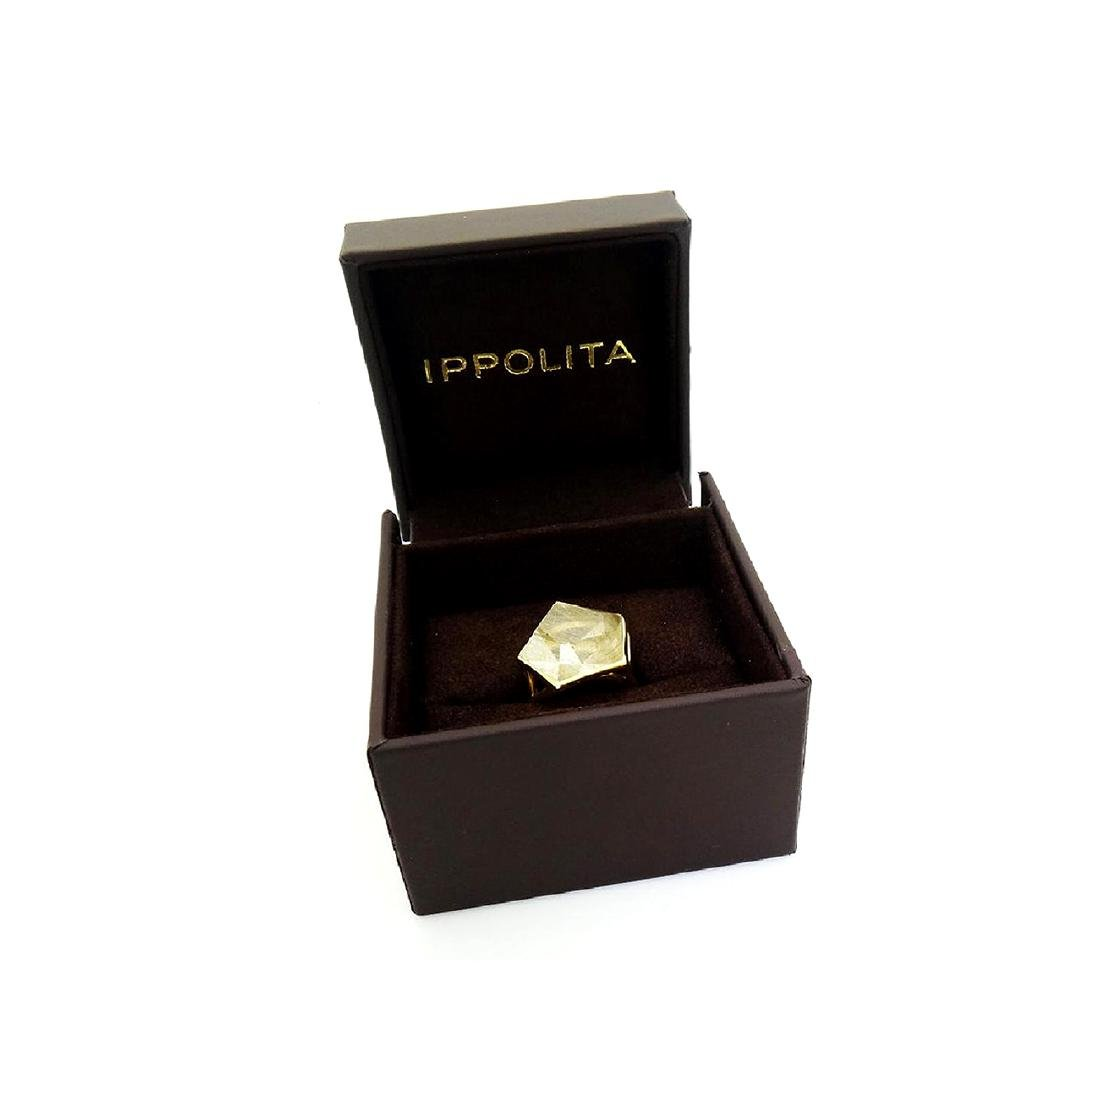 Ippolita 18k Yellow Gold & Large Quartz Rock Candy - 8